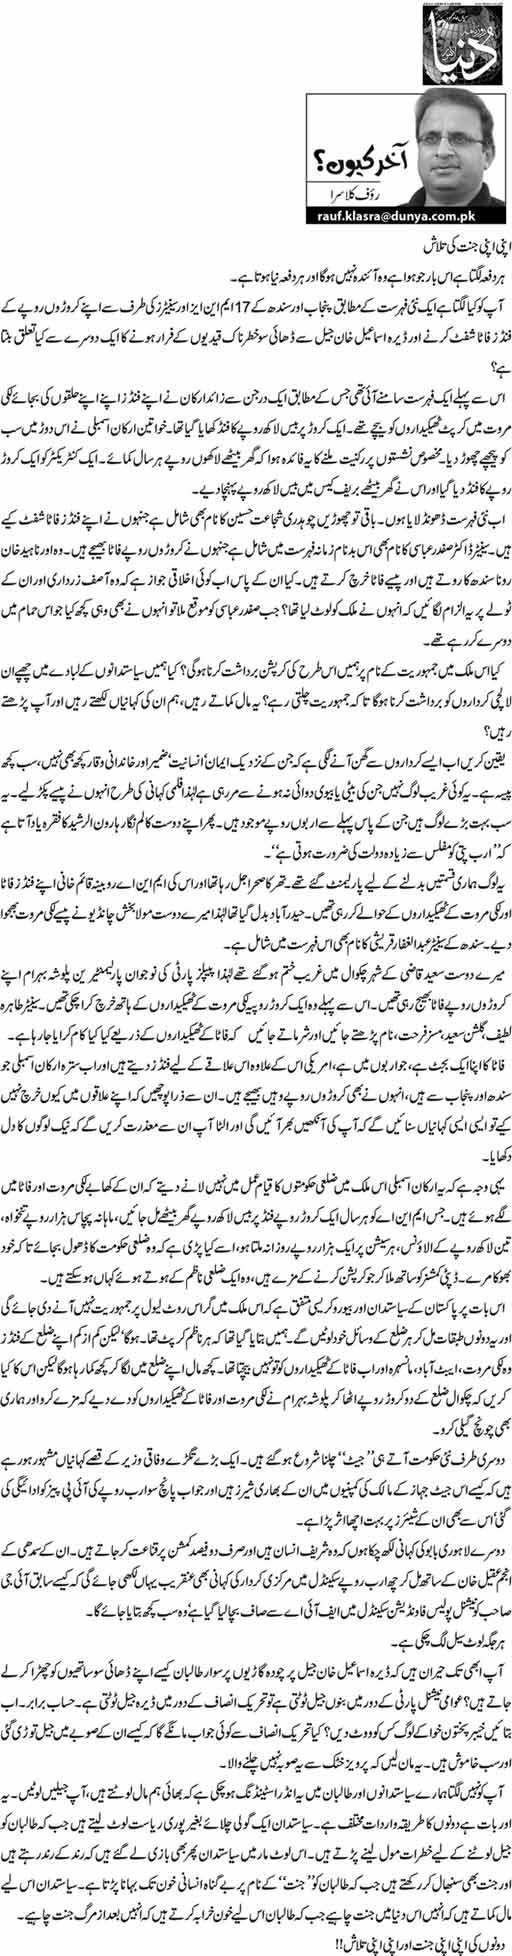 Apni Apni Jannat ki Talash - Rauf Klasra